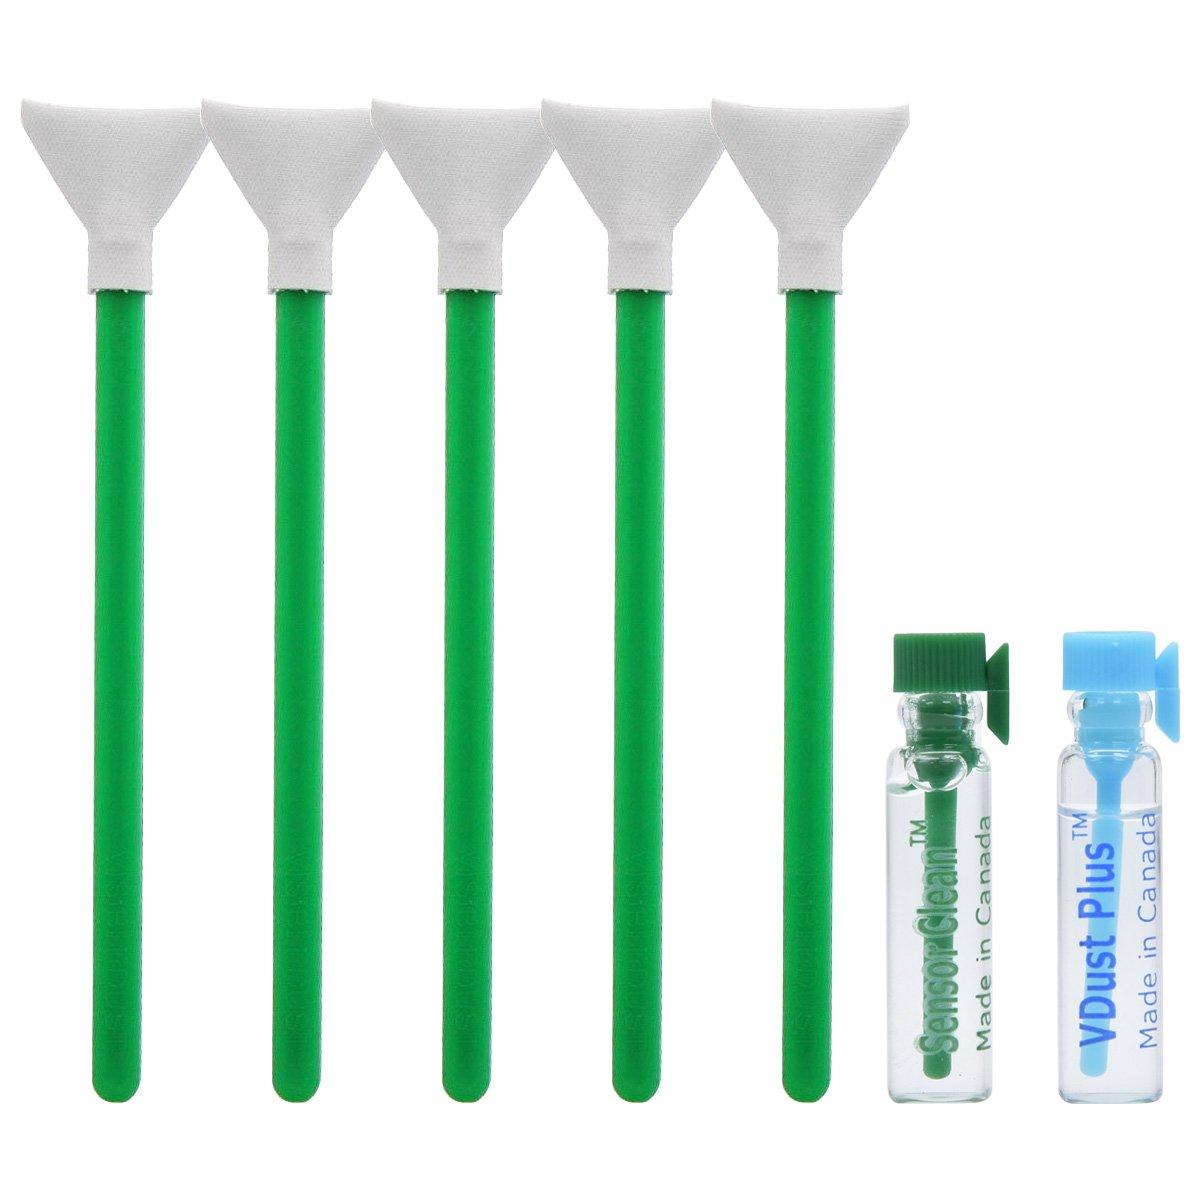 VisibleDust EZ Sensor Dual Power-X Cleaning Kit (Regular Strength) for Size 1.3x (20mm) DSLR & Micro 4/3 Cameras with 1ml Liquid vDust Plus, 1ml Liquid Sensor Clean & 5 Vswabs by VisibleDust (Image #1)